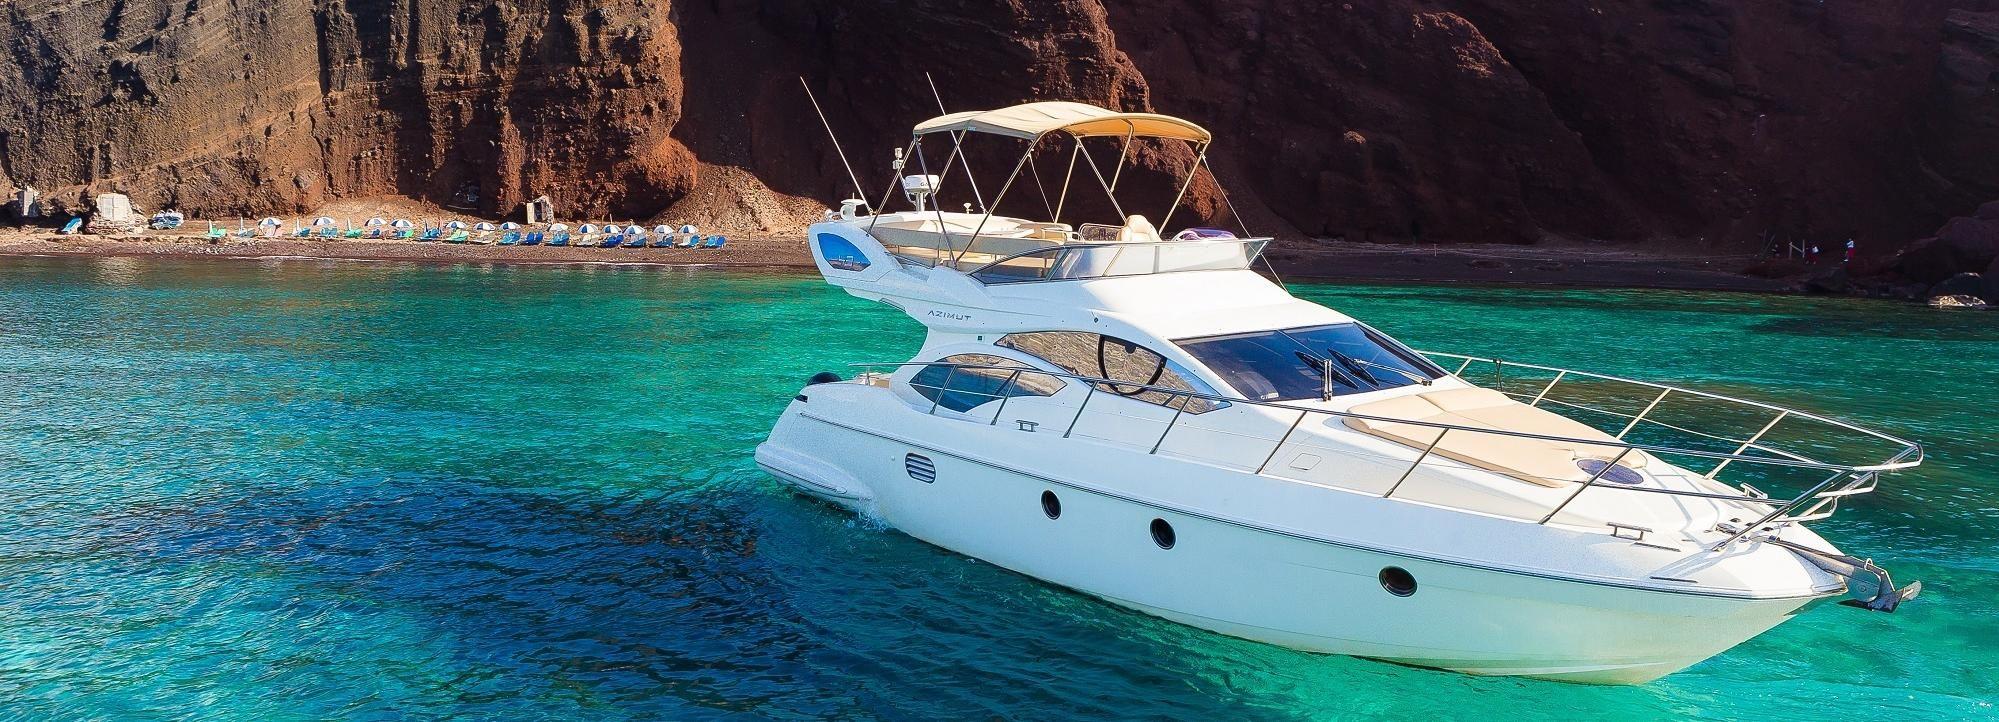 Santorini: Isla destacada crucero en un lujoso yate